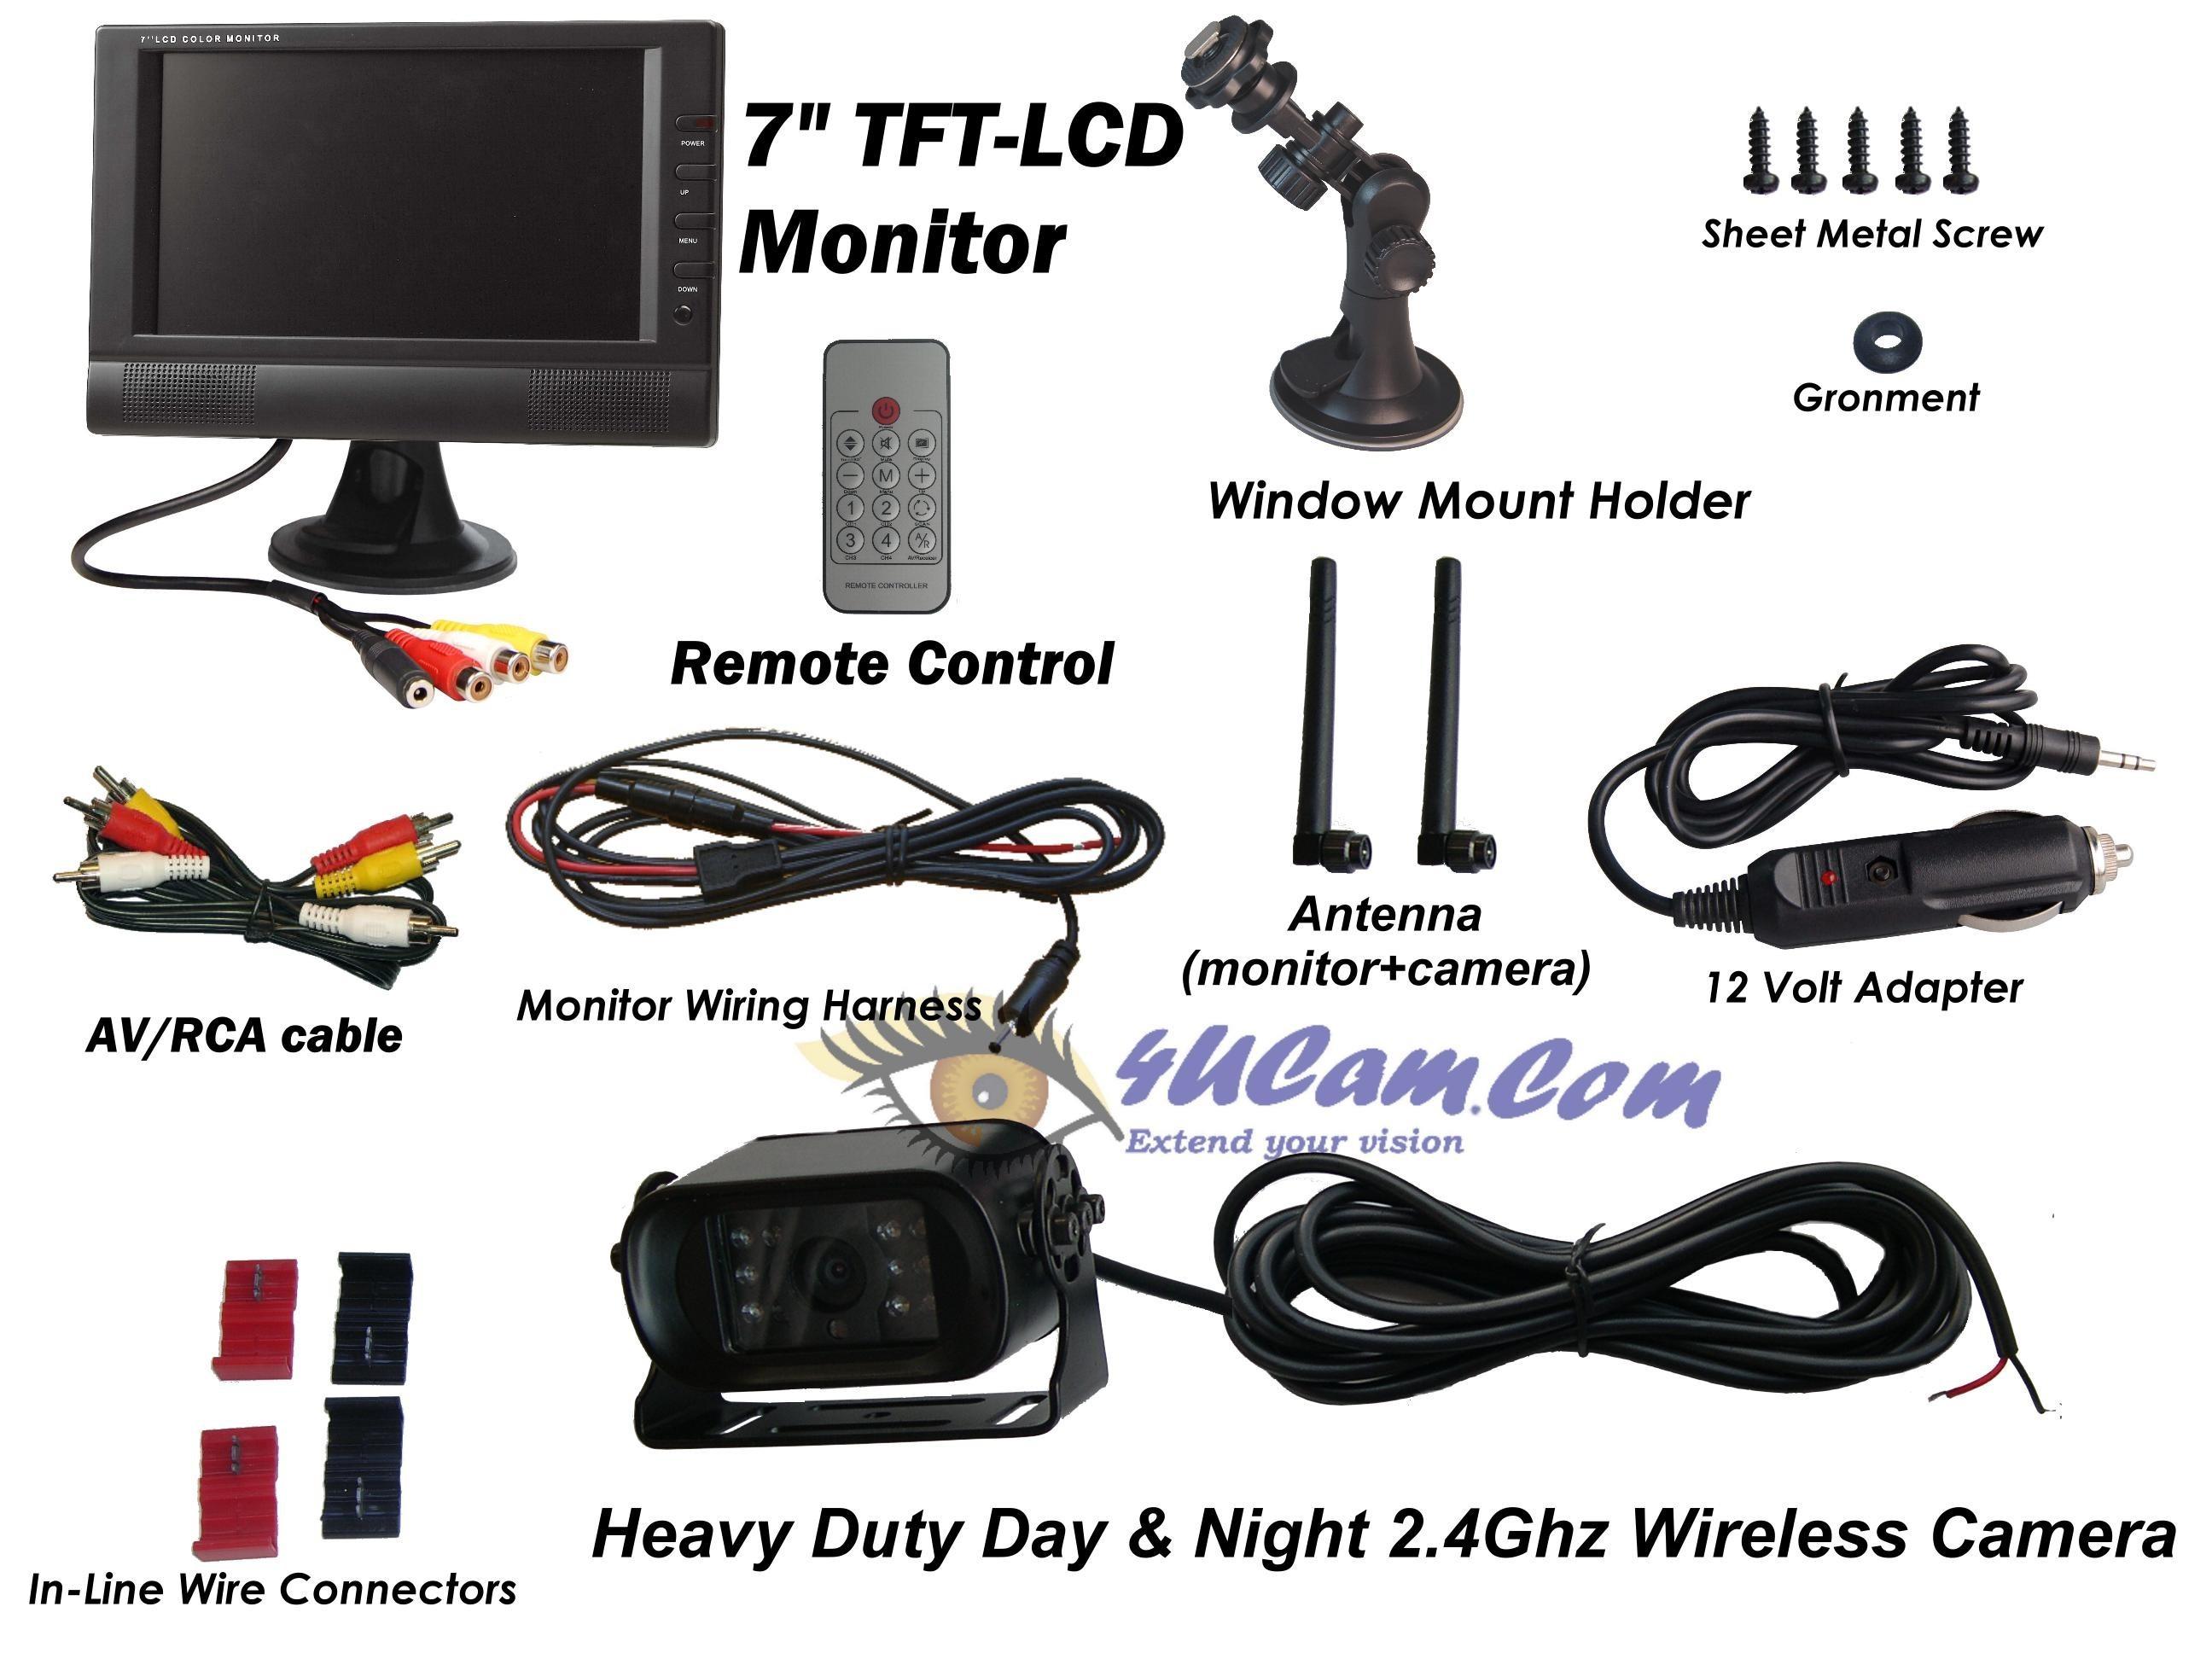 Car Tft Lcd Monitor Wiring Diagram Wiring Diagram for Rv Backup Camera New Wireless Car Backup Camera Of Car Tft Lcd Monitor Wiring Diagram